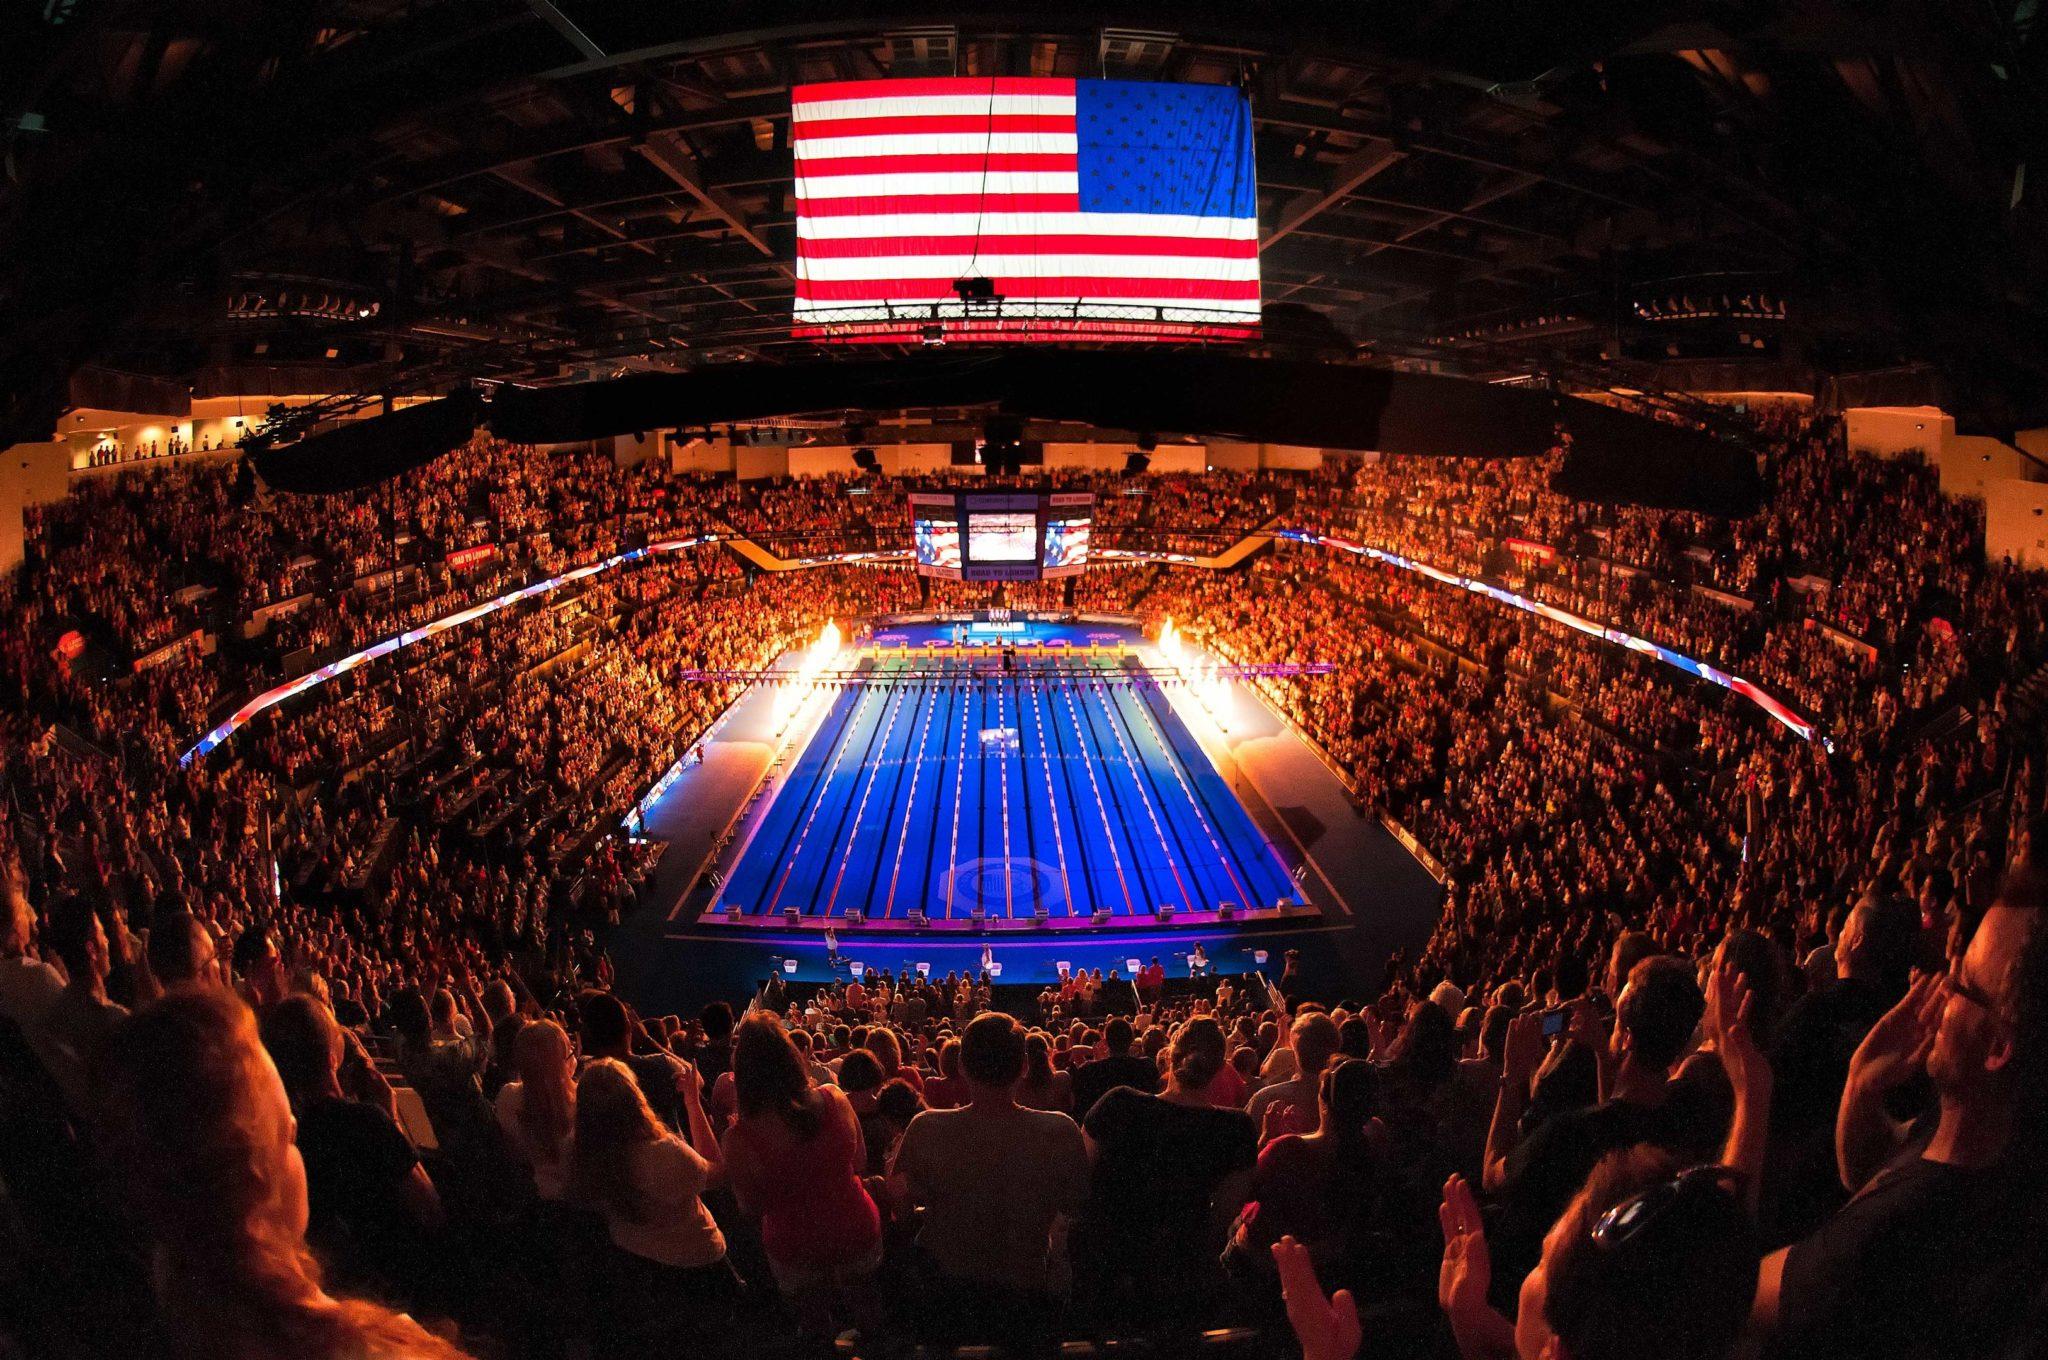 U.S Olympic Committee Announces 555- member 2016 U.S Olympic Team